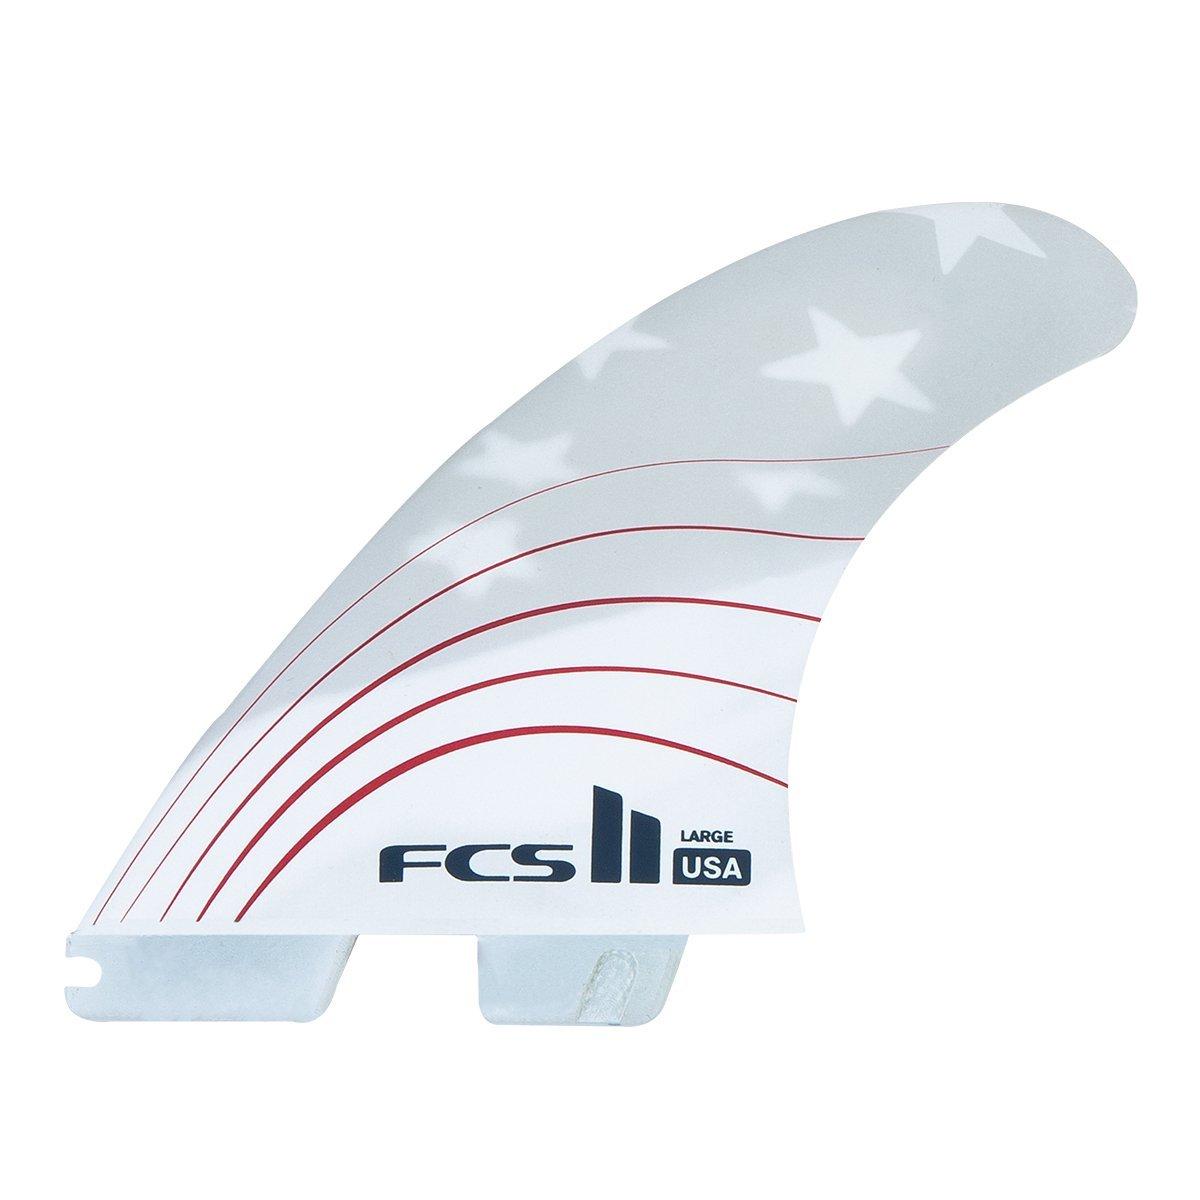 FCS11 USA PC TRI